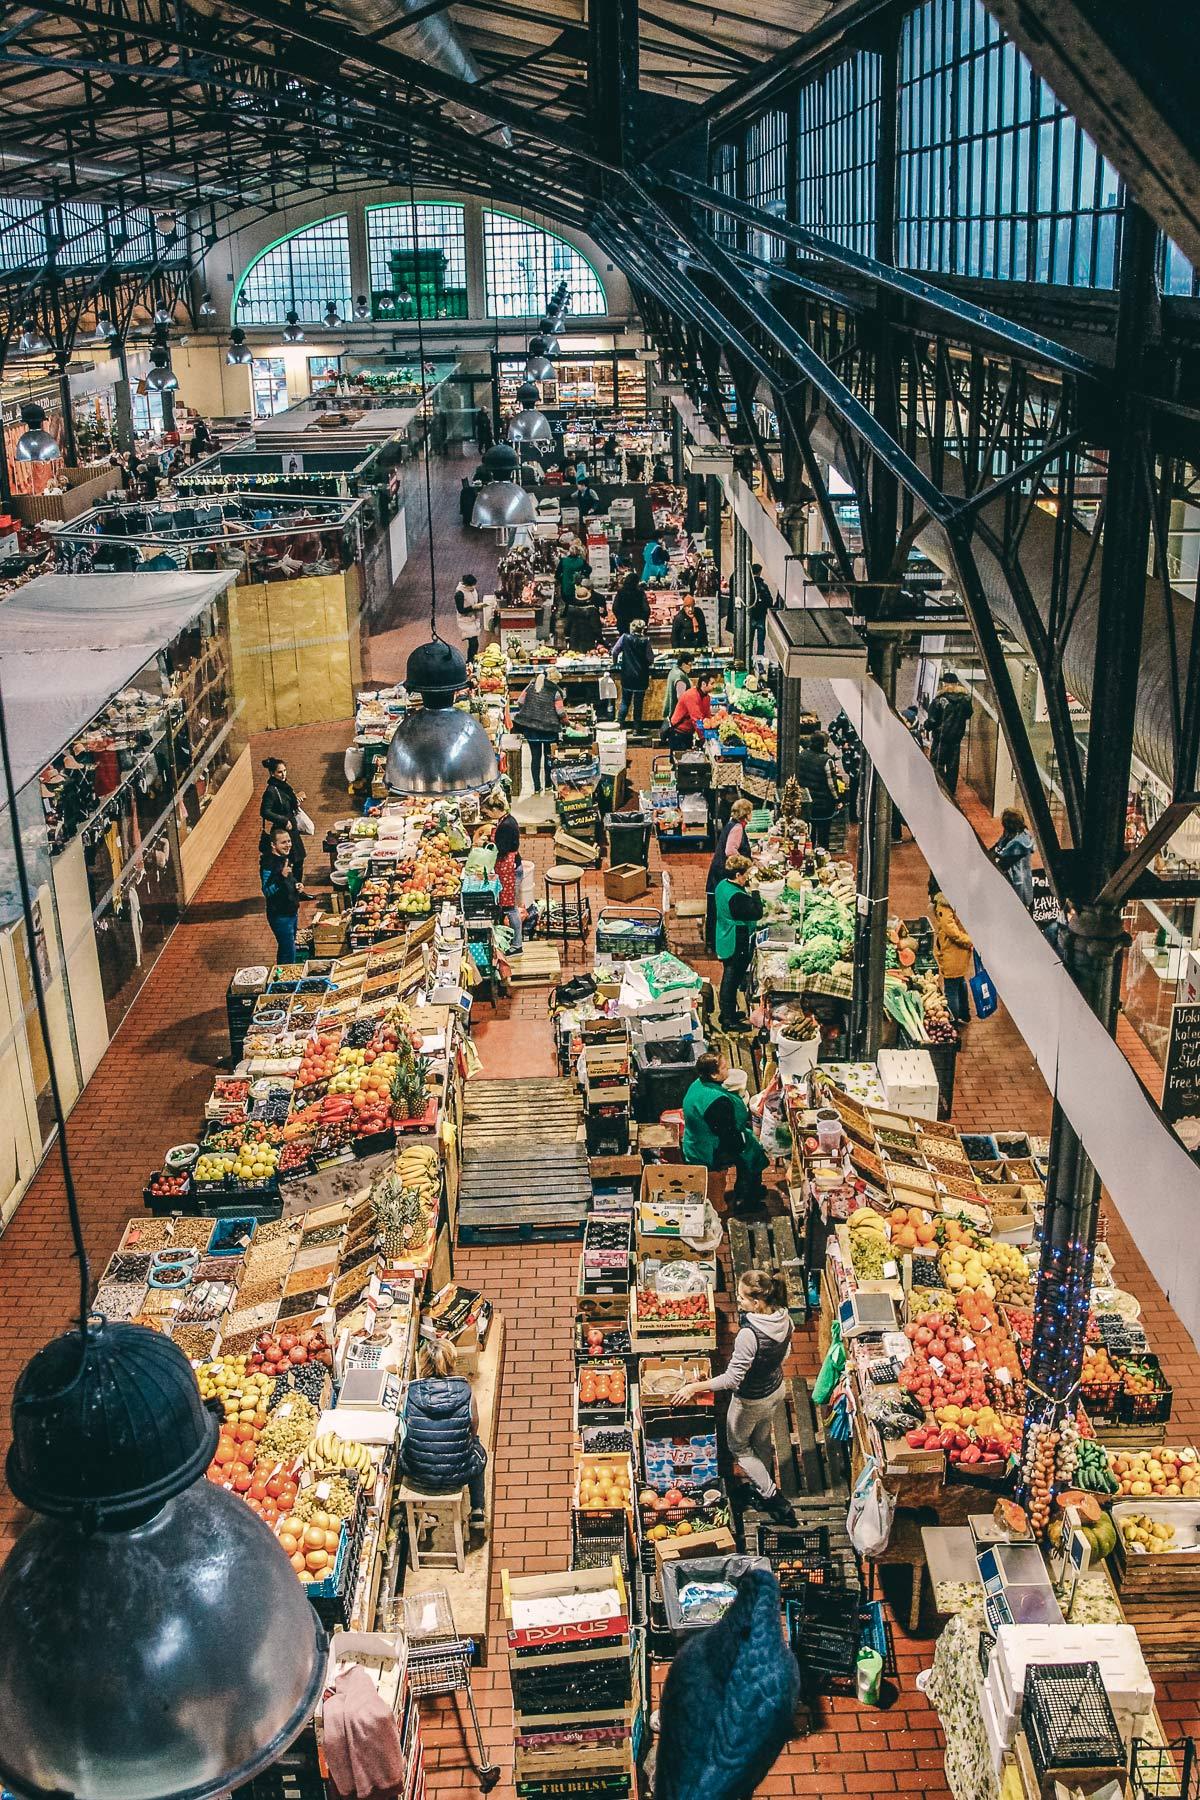 vilnius markthalle